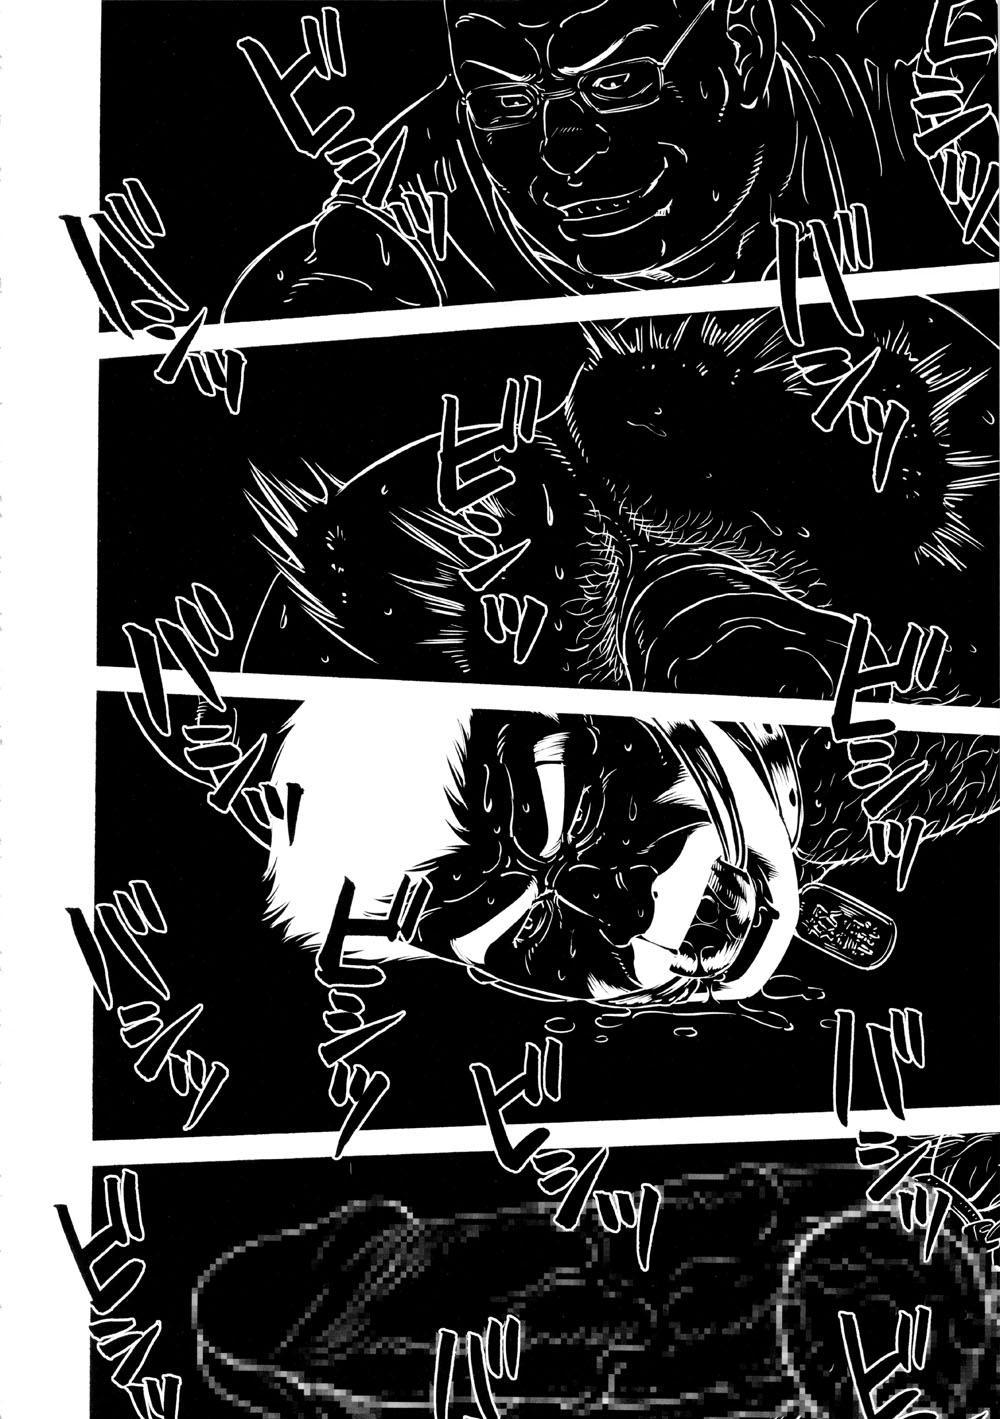 Genryu Chapter 3 11